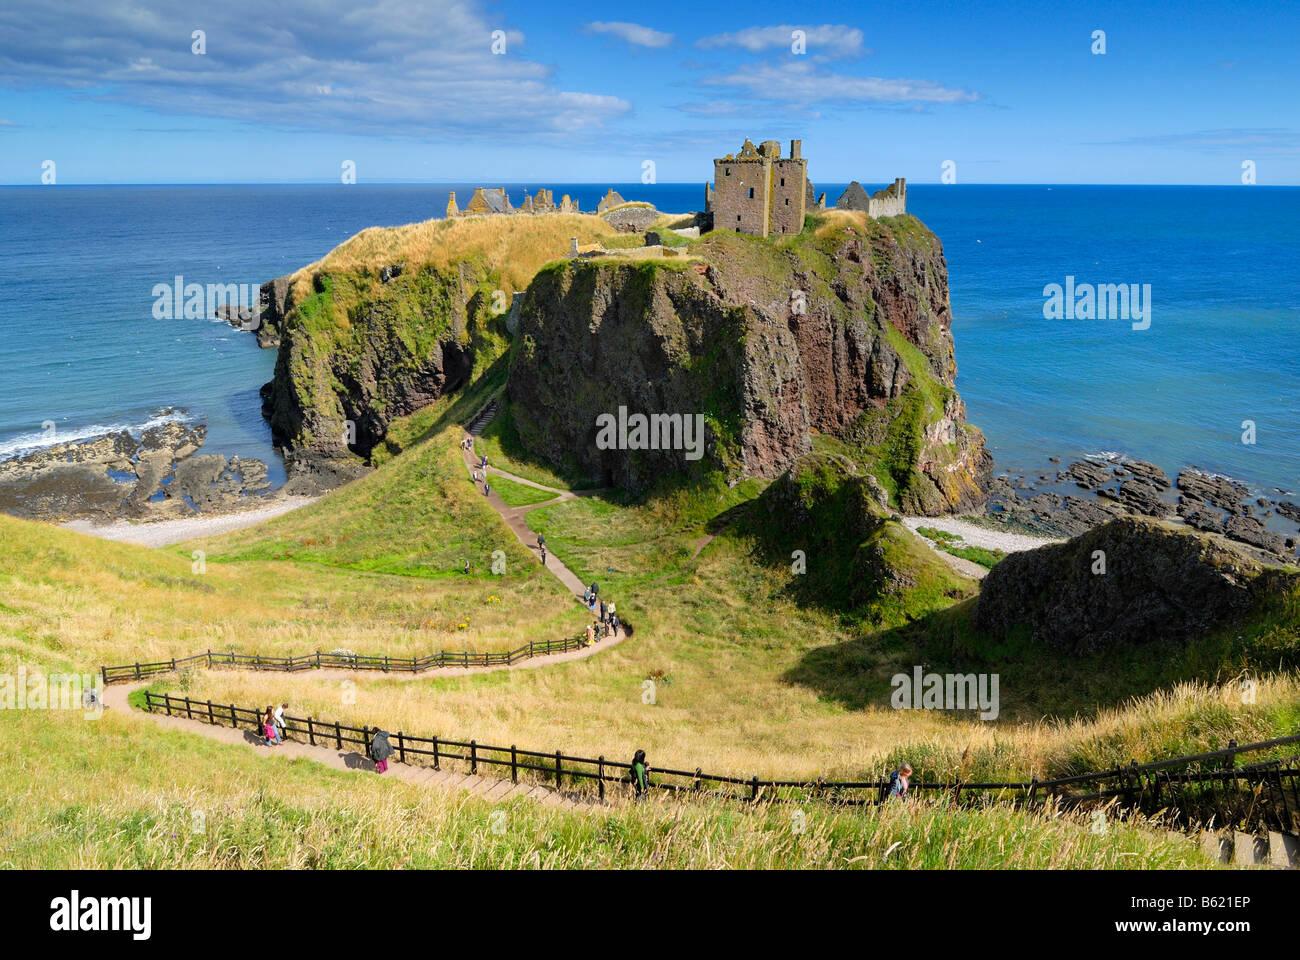 Dunnottar Castle, Scotland, Great Britain, Europe - Stock Image